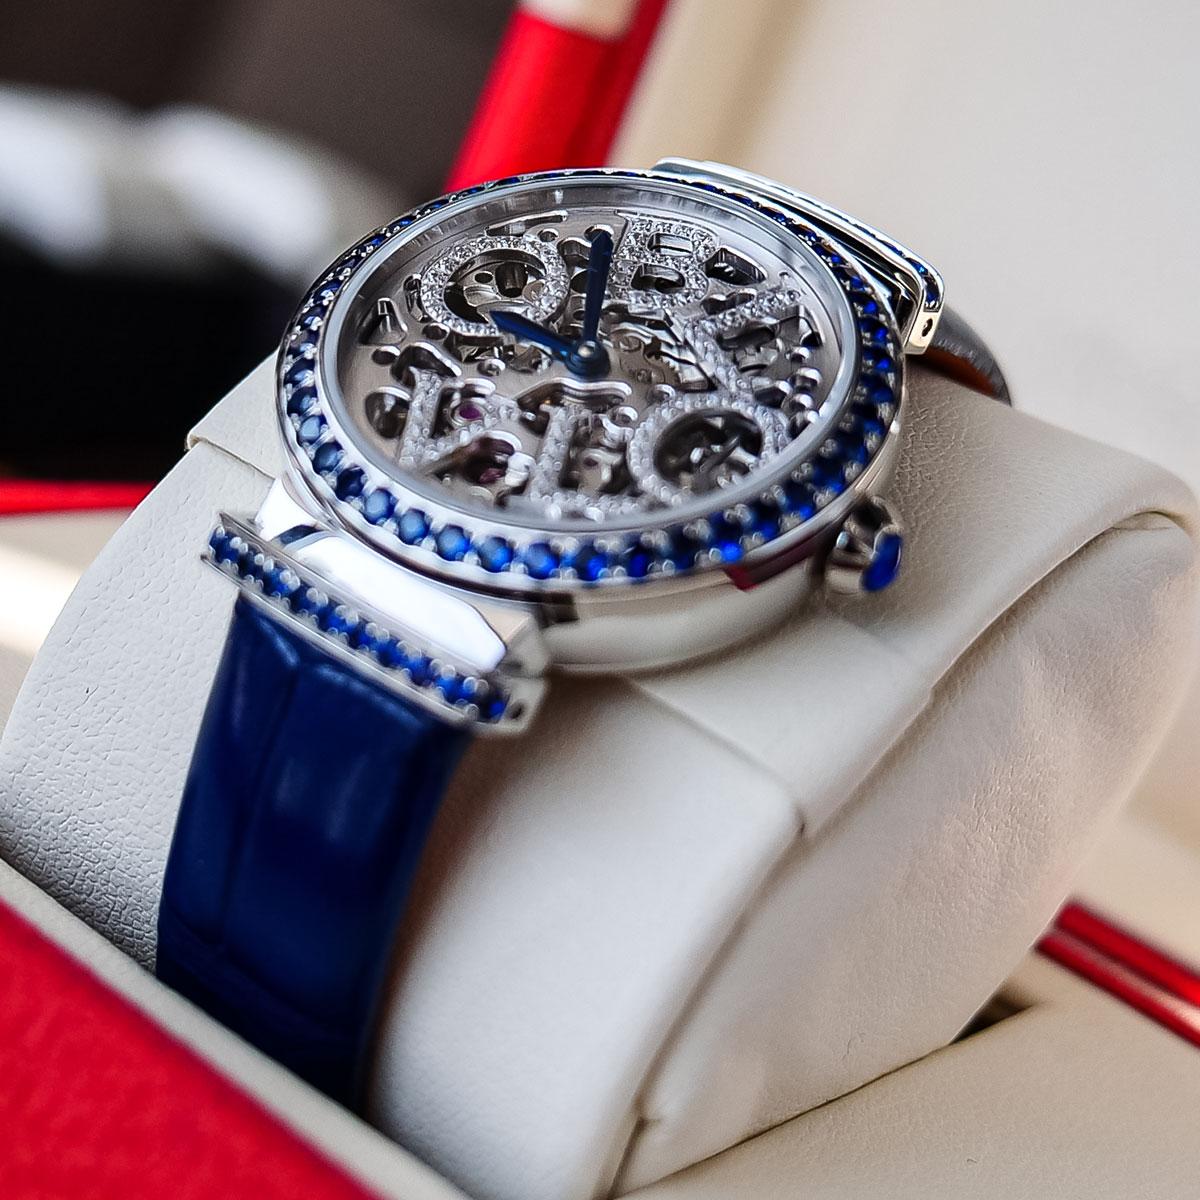 OBLVLO New Design Women Steel Skeleton Automatic Watches Top Brand Luxury Female Wrist Watch Clock Leather Relogio Feminino enlarge